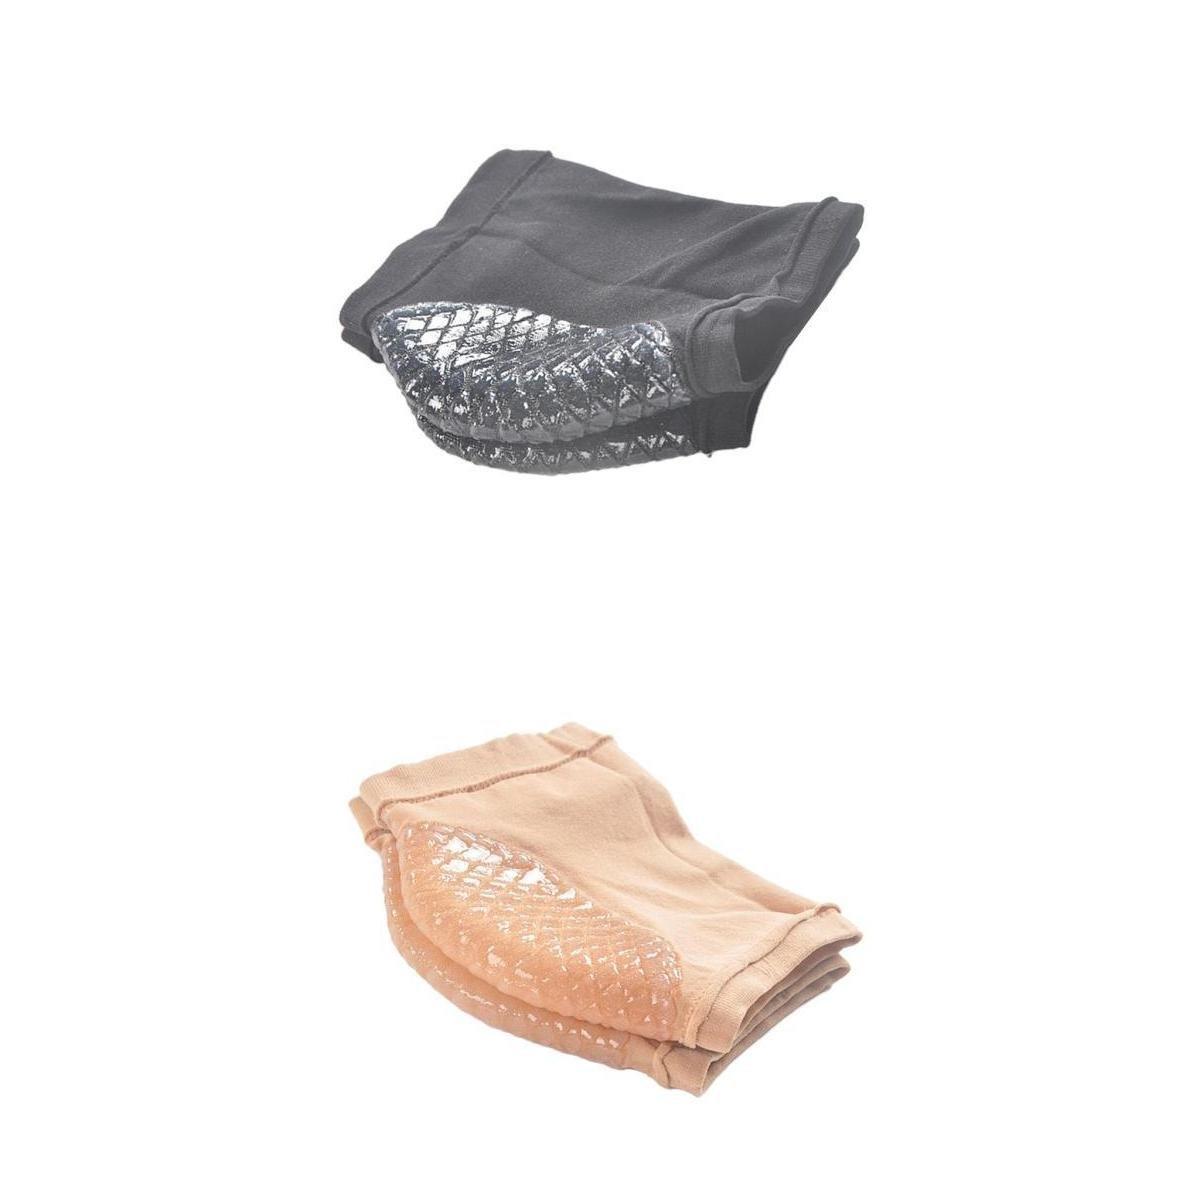 Bonarty 2 Pairs Low price Gel Heel Socks for Hard Mo Skin Price reduction Cracked Dry Foot